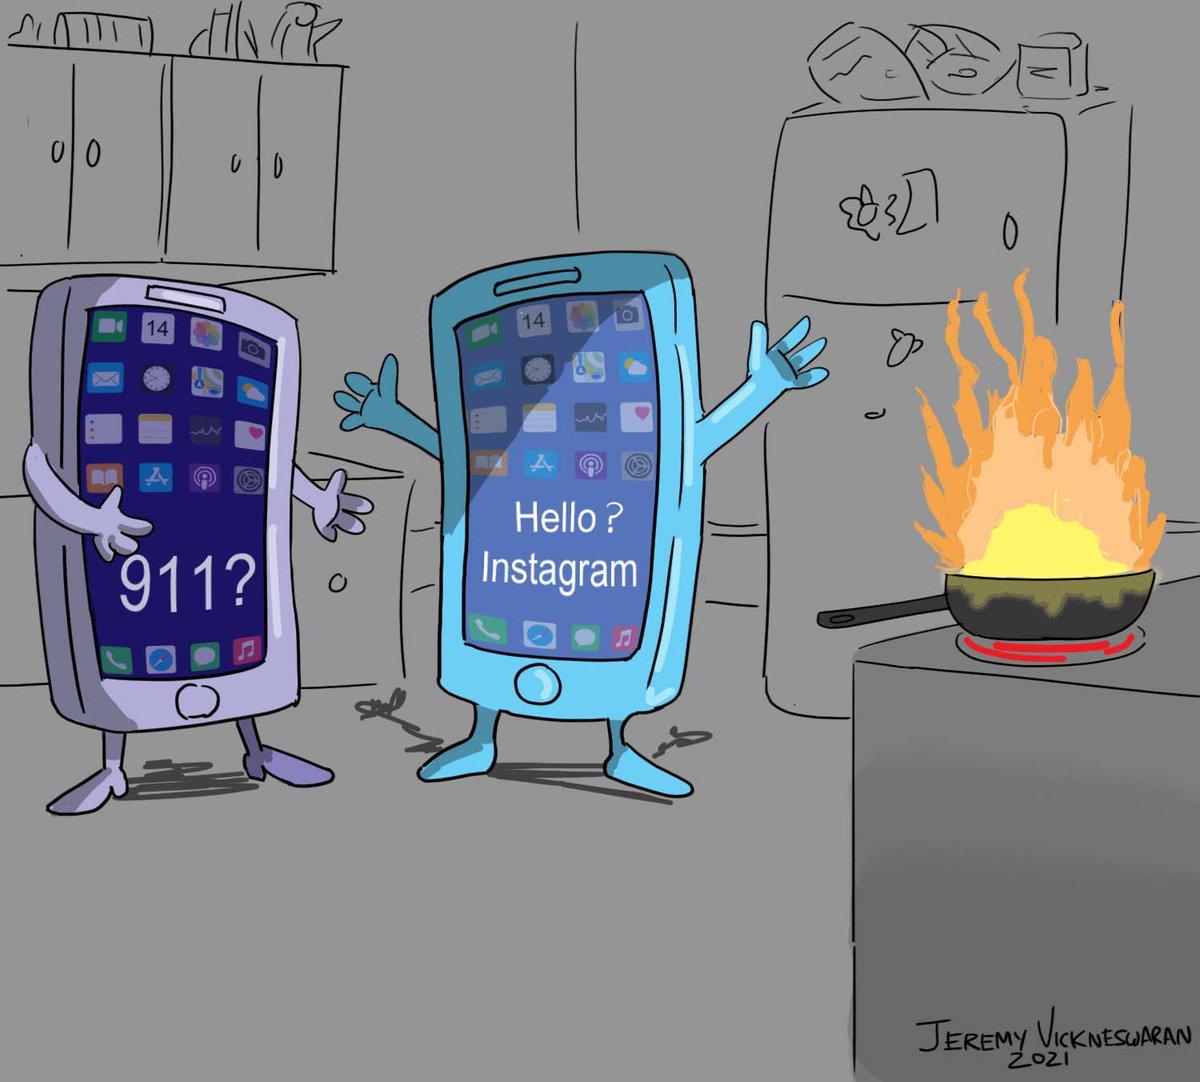 Cell Phone Humor Thursday #art #comic #comics  #comicstrip #comicstrips #humor  #sketch #illustration #doodle #cartoon #cartooning #dailycomic  #webcomic #digitalart #originalcharacter #characterdesign  #artwork #myart #myartwork #makearteveryday  #illustrator #thursdaymorning